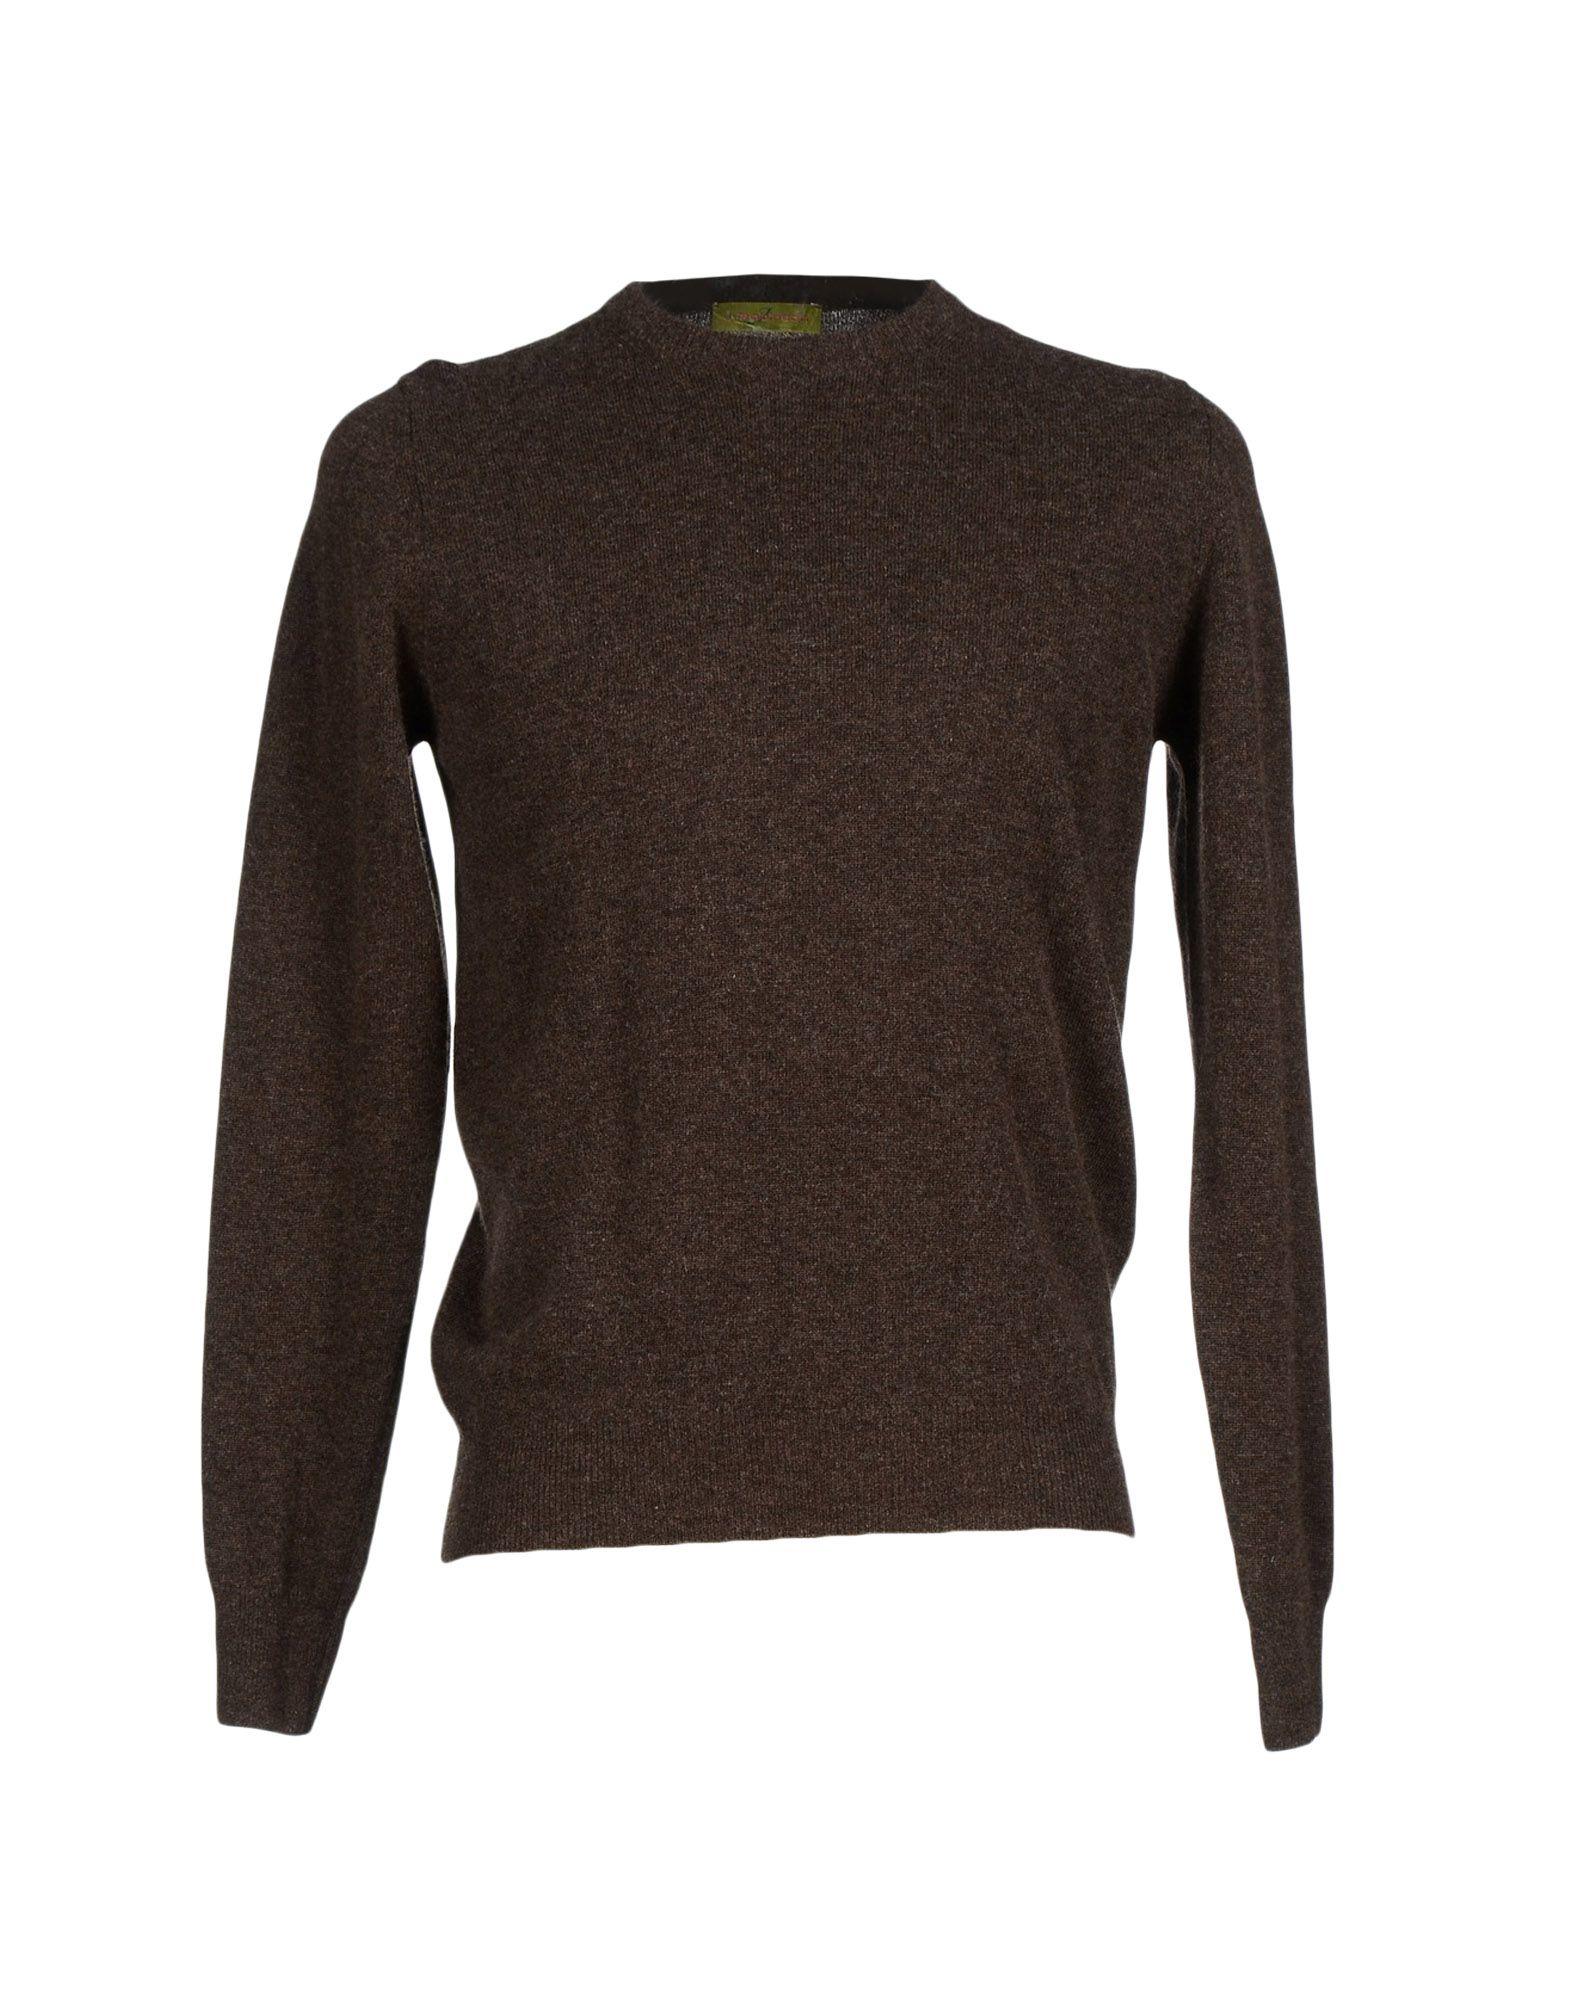 brand new 46872 85ee3 james-robinson-dark-brown-sweater-brown-product-1-015067545-normal.jpeg